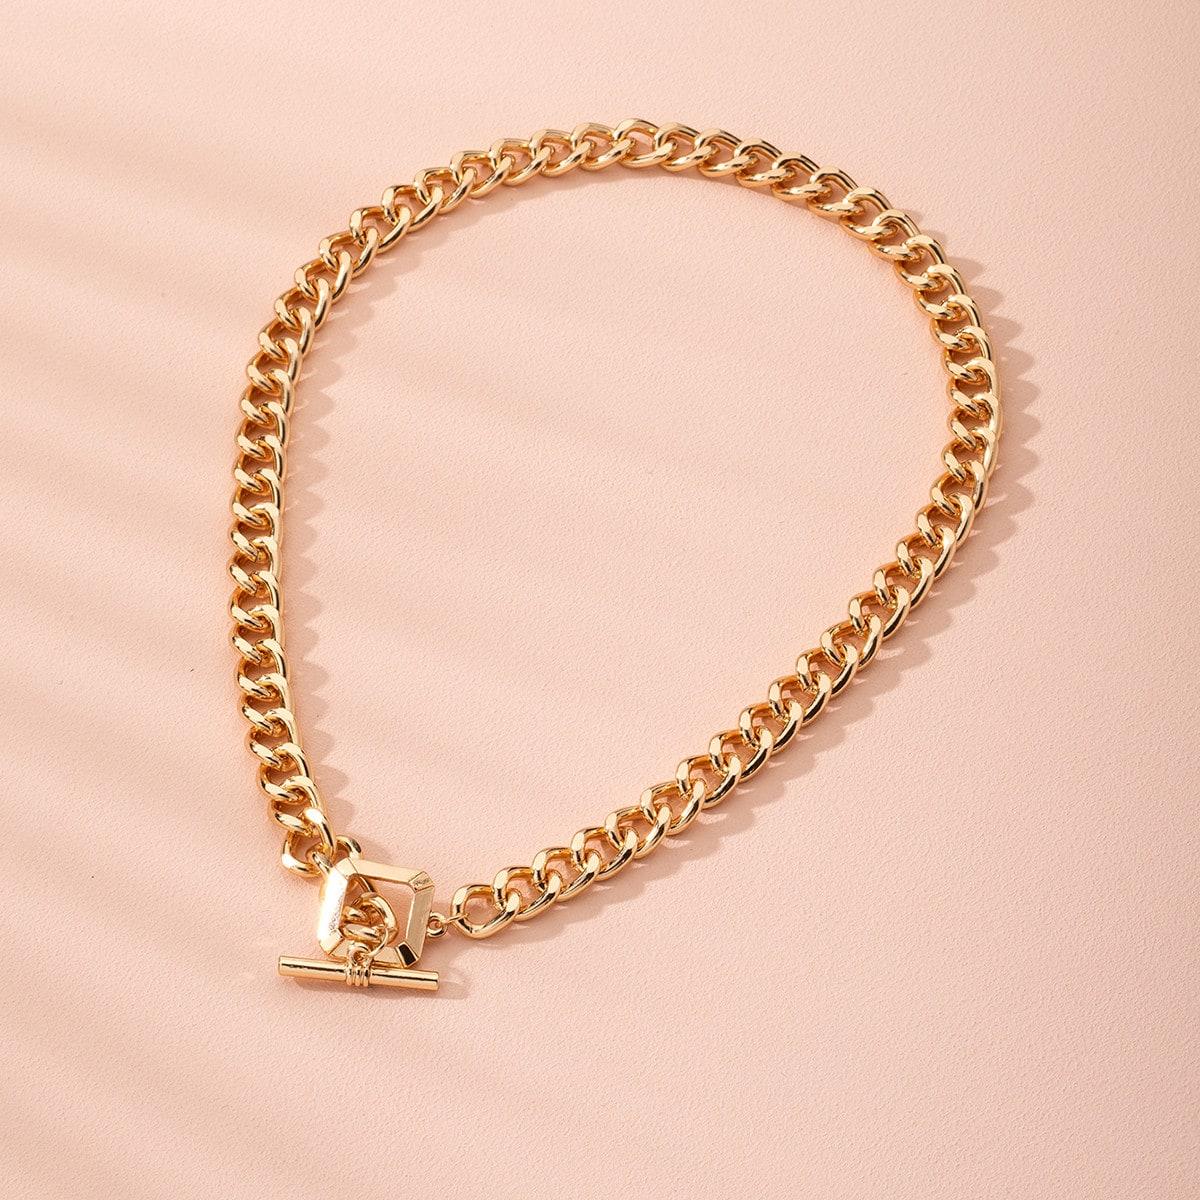 Ожерелье-цепочка с геометрическим декором фото